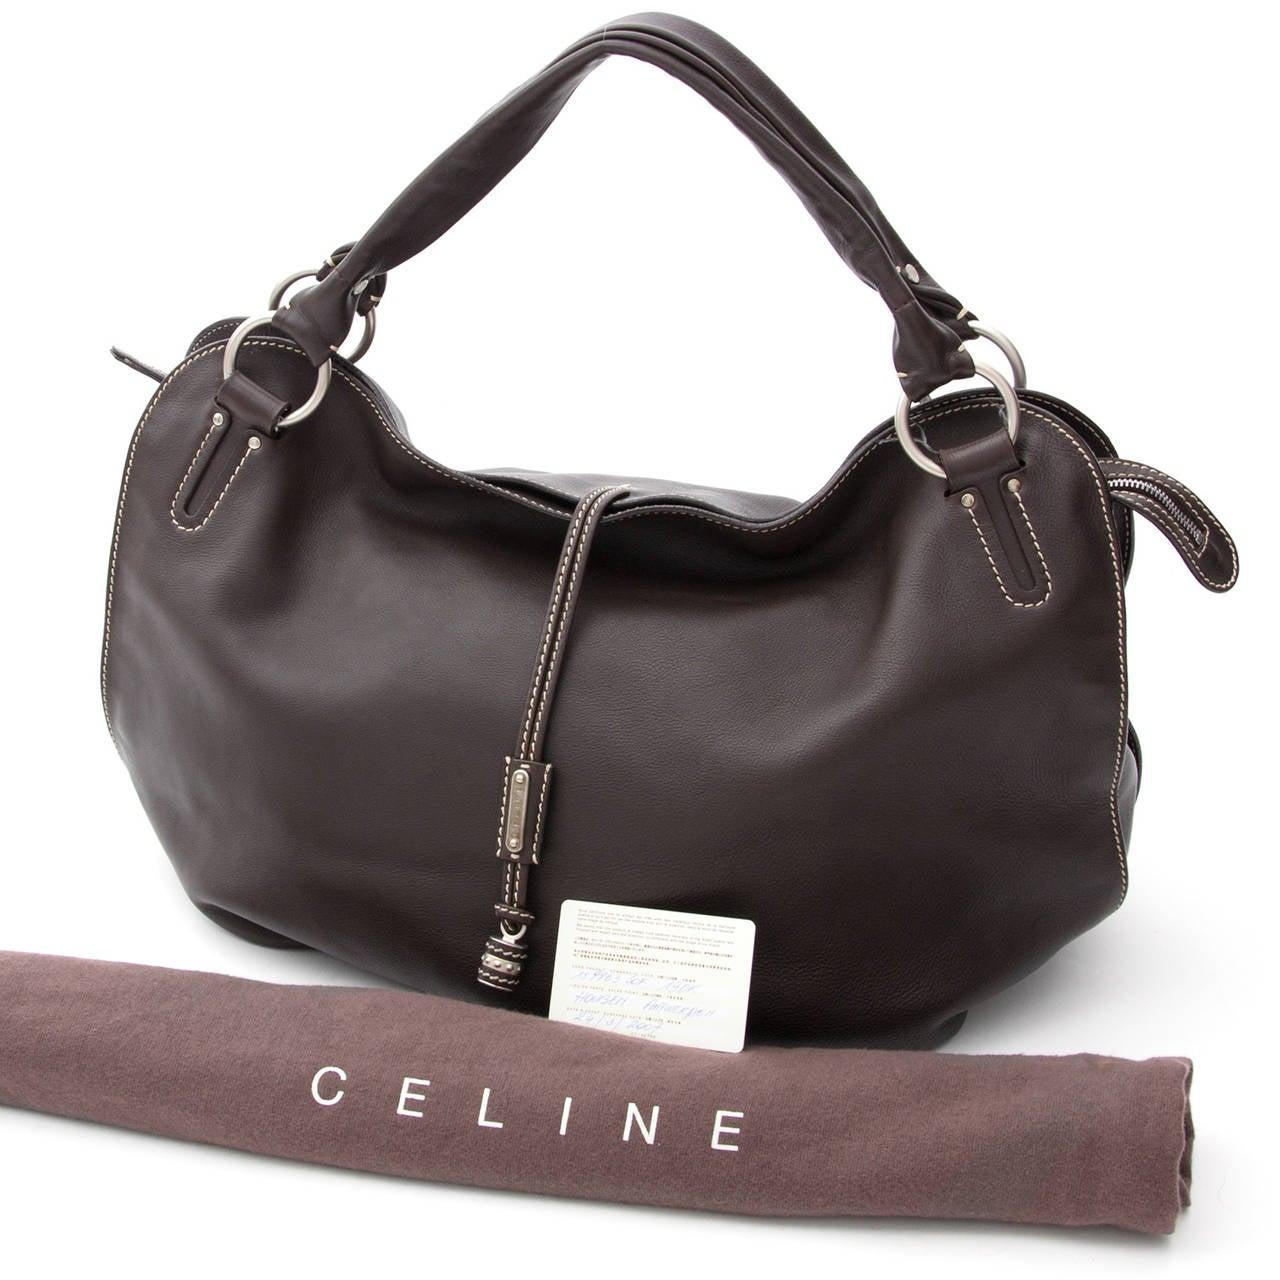 Celine Bittersweet Dark Brown Large Hobo Bag For Sale at 1stdibs